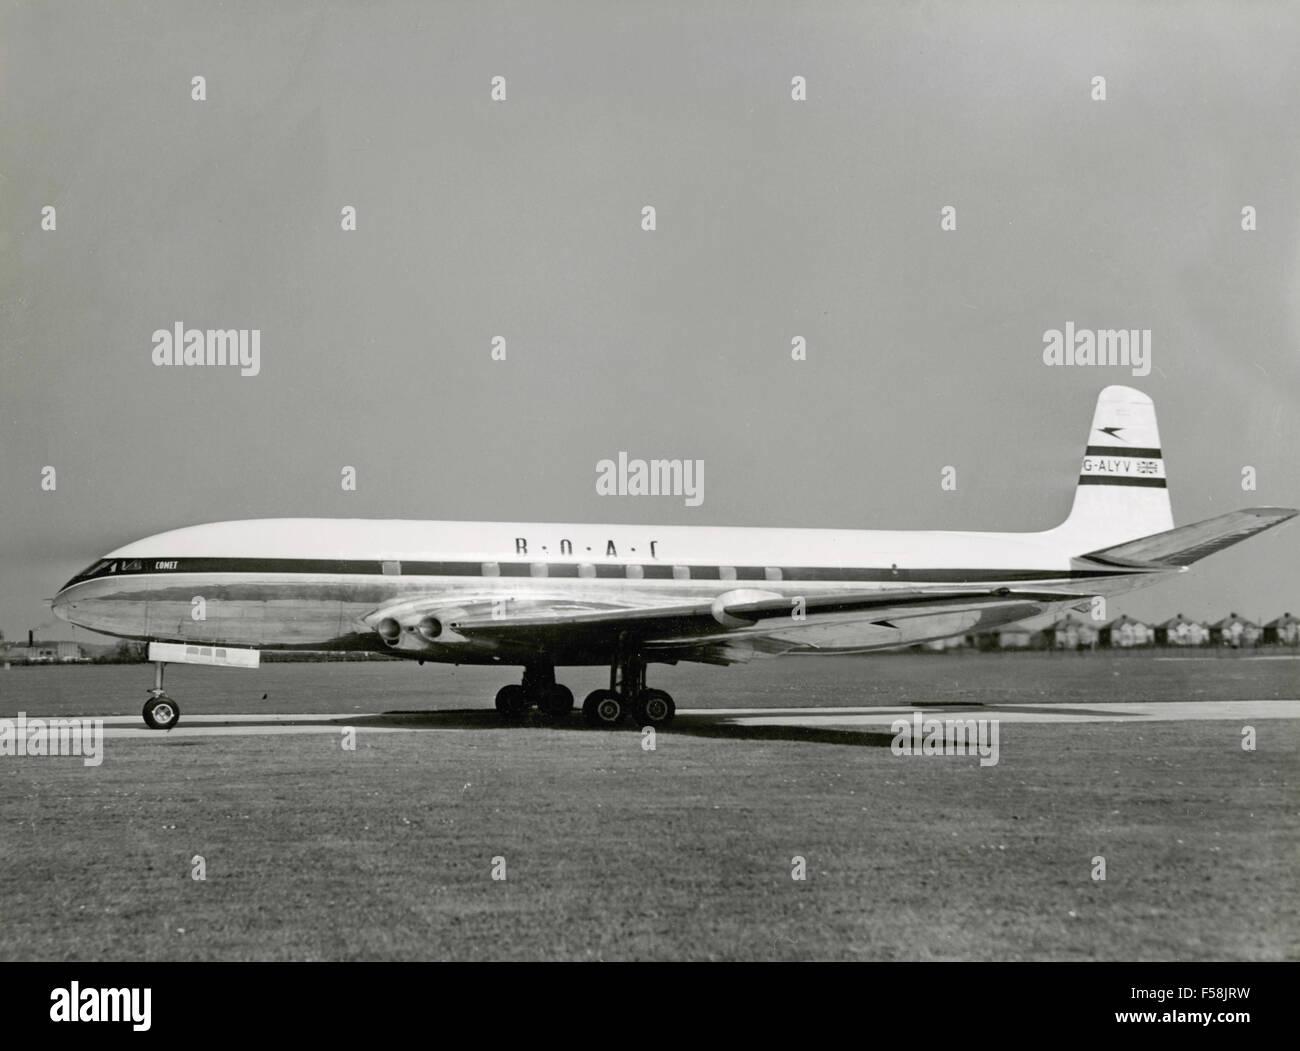 The aircraft De Havilland Comet 1 G-BOAC ALYX - Stock Image